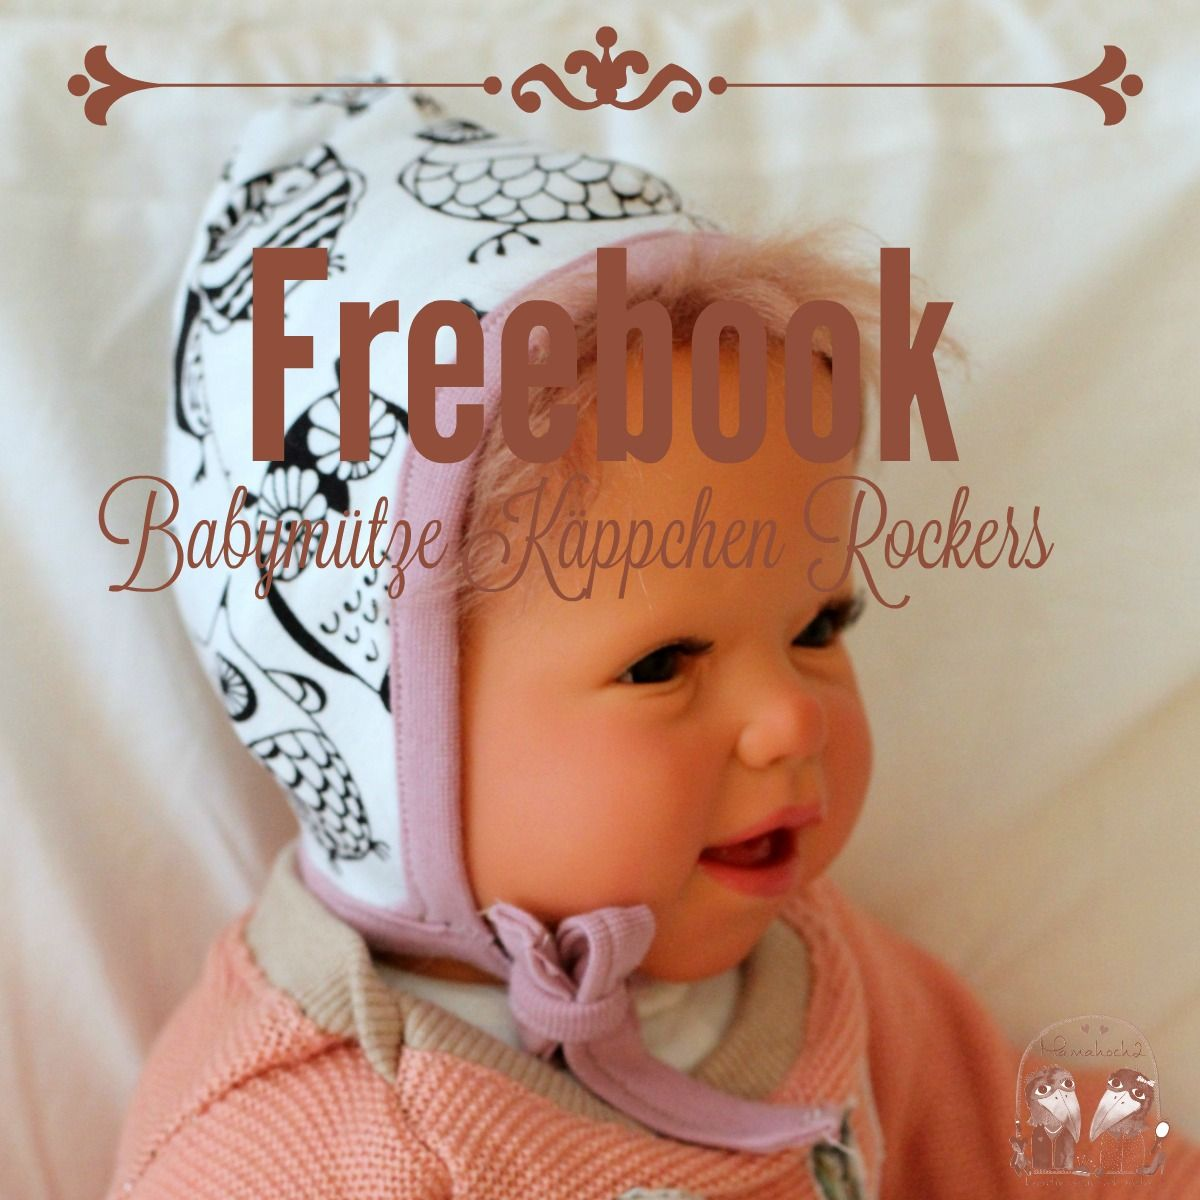 Freebook Käppchen Rockers